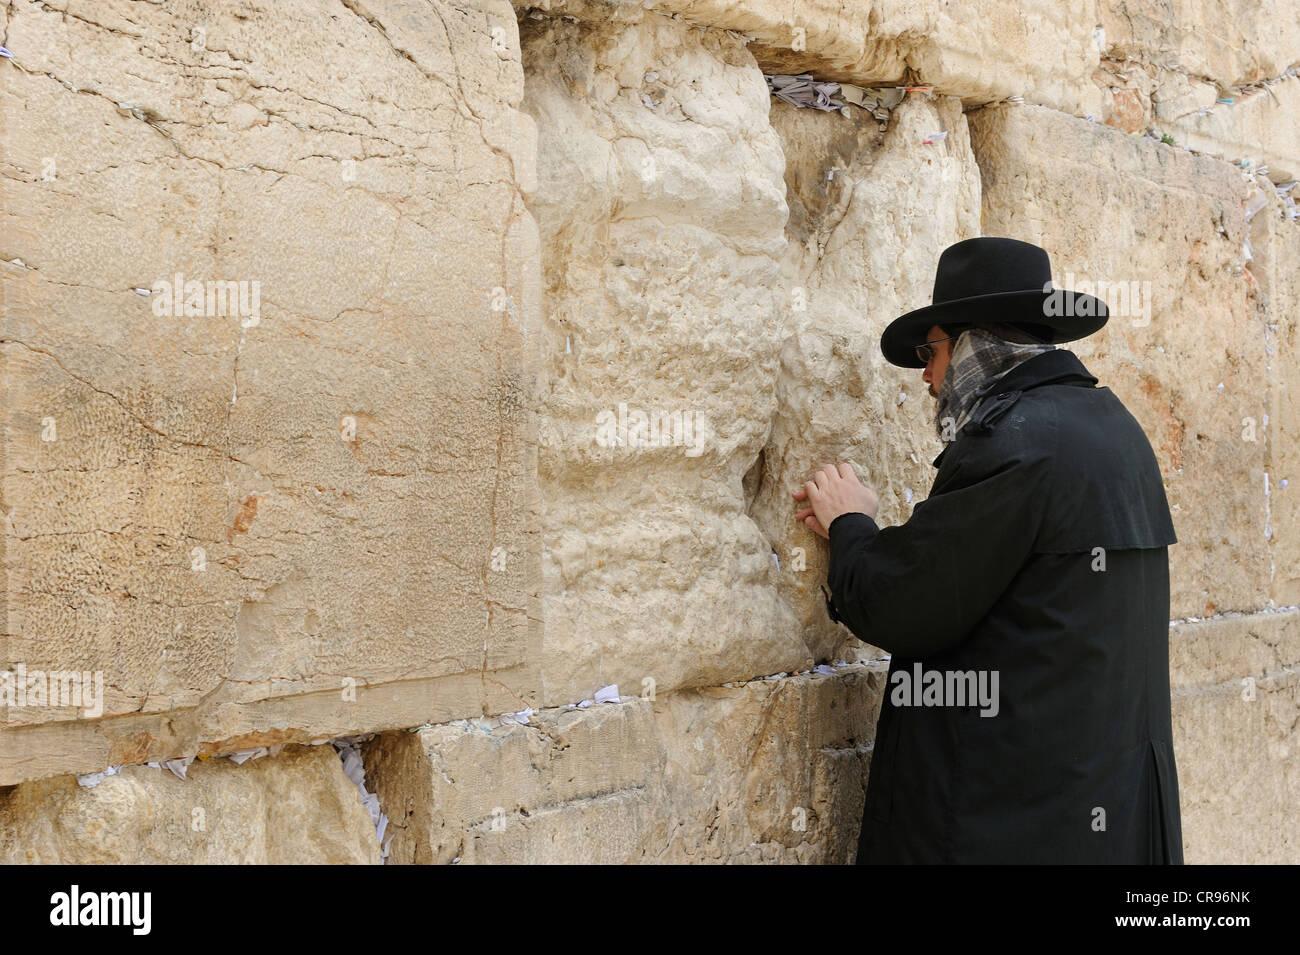 Orthodox Jew praying at the Western Wall, Wailing Wall, Old City, Arab Quarter, Jerusalem, Israel, Western Asia - Stock Image